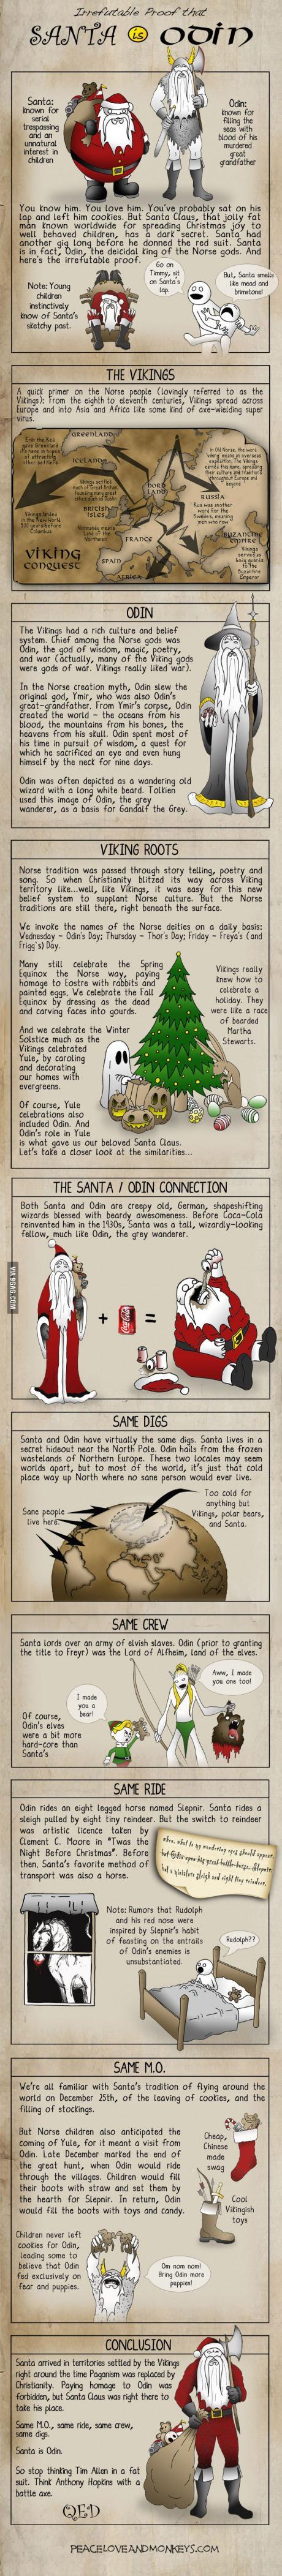 Irrefutable Proof That Santa Is Odin